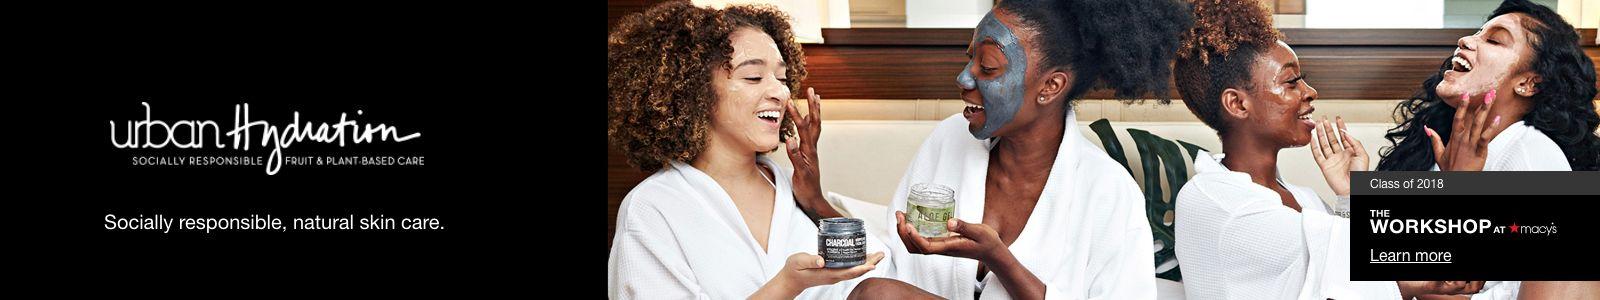 Urban hydration, Socially  responsible , natural skin care